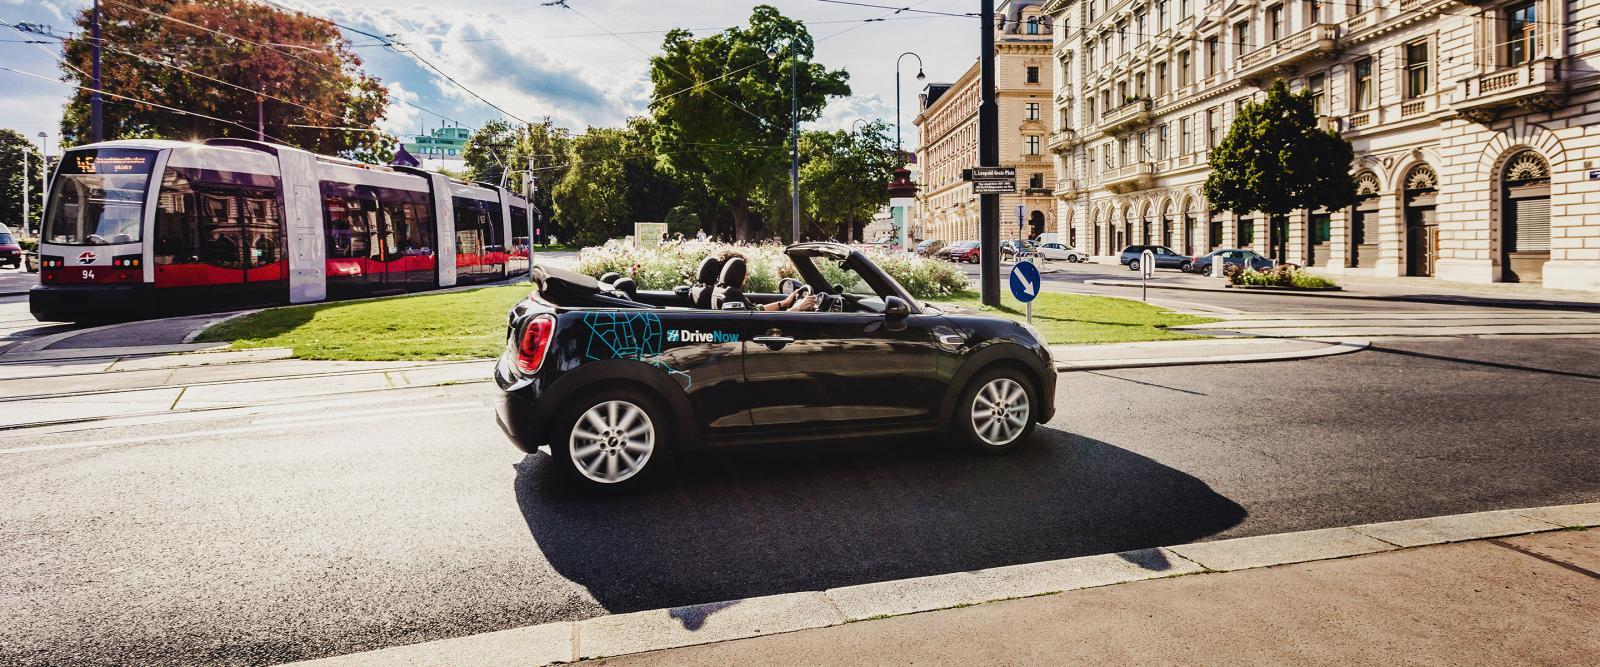 drivenow_carsharing_wien_mini_cabrio